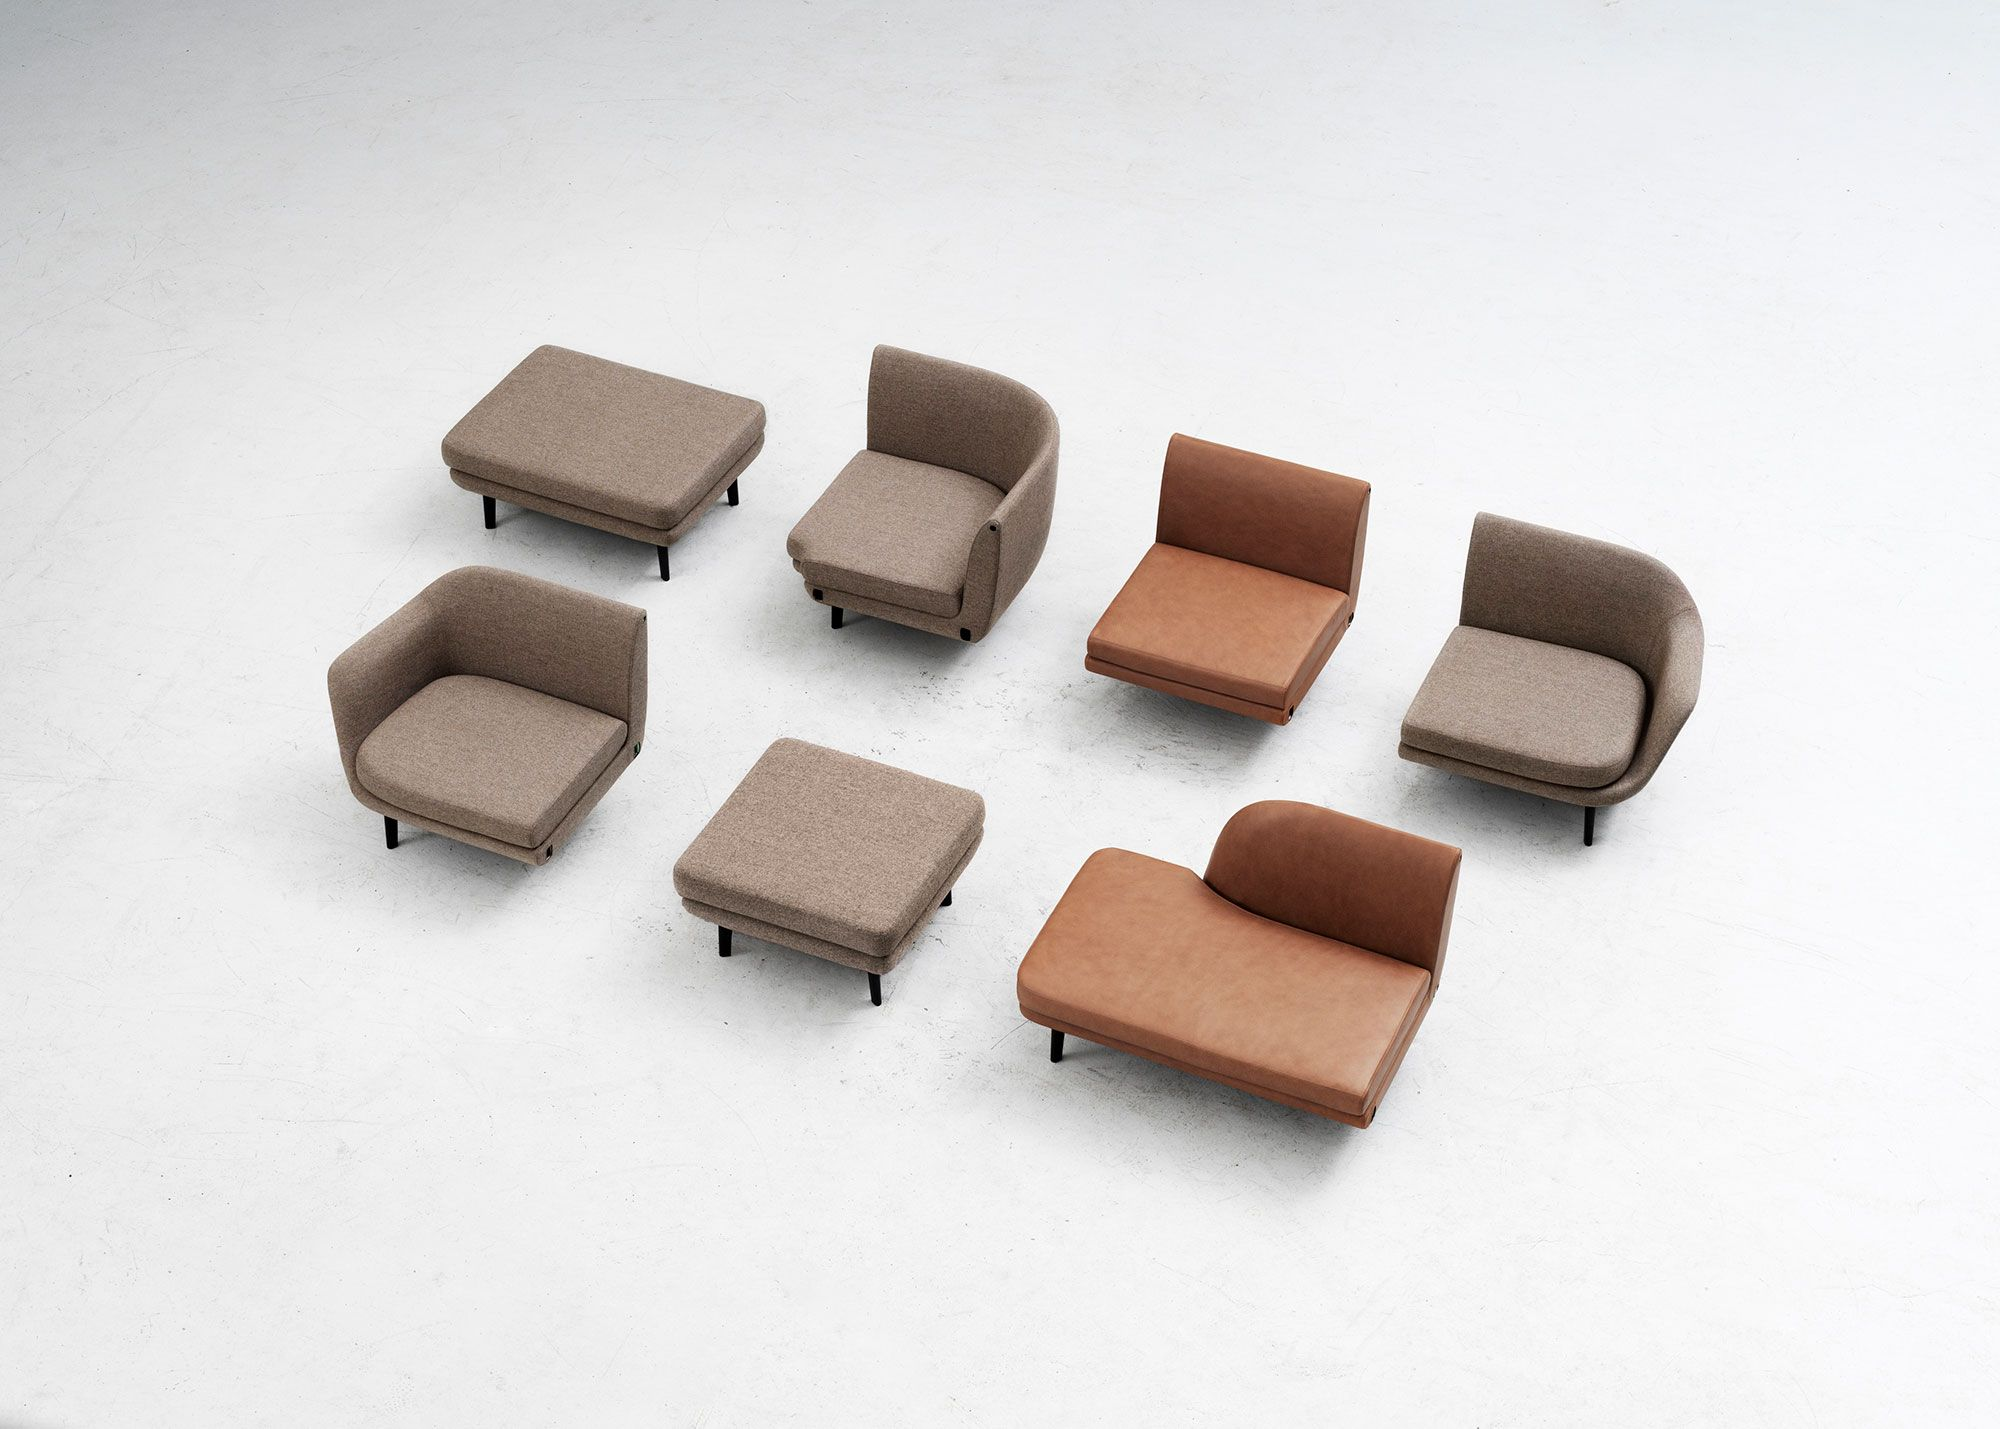 Choose Between Different Elements To Build Your Own Dream Sofa Sum Modular Sofa By Normann Copenhagen Modular Sofa Customised Sofa Sofa Design